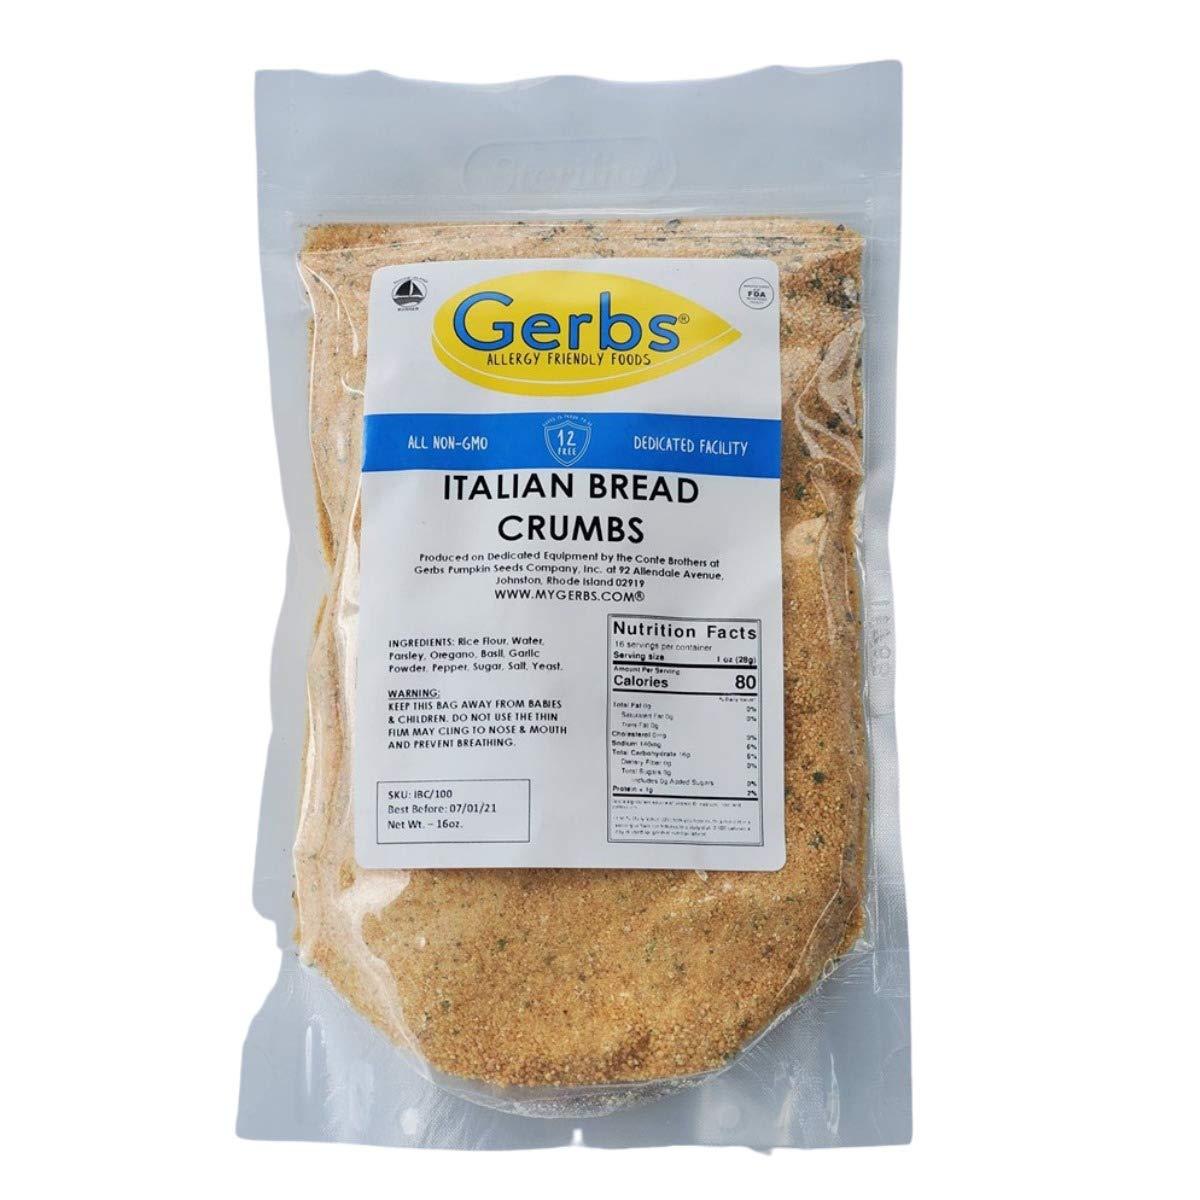 GERBS Italian Breadcrumbs, 32 ounce, Top 14 Food Allergen Free, Preservative Free, Keto, Vegan, Non GMO